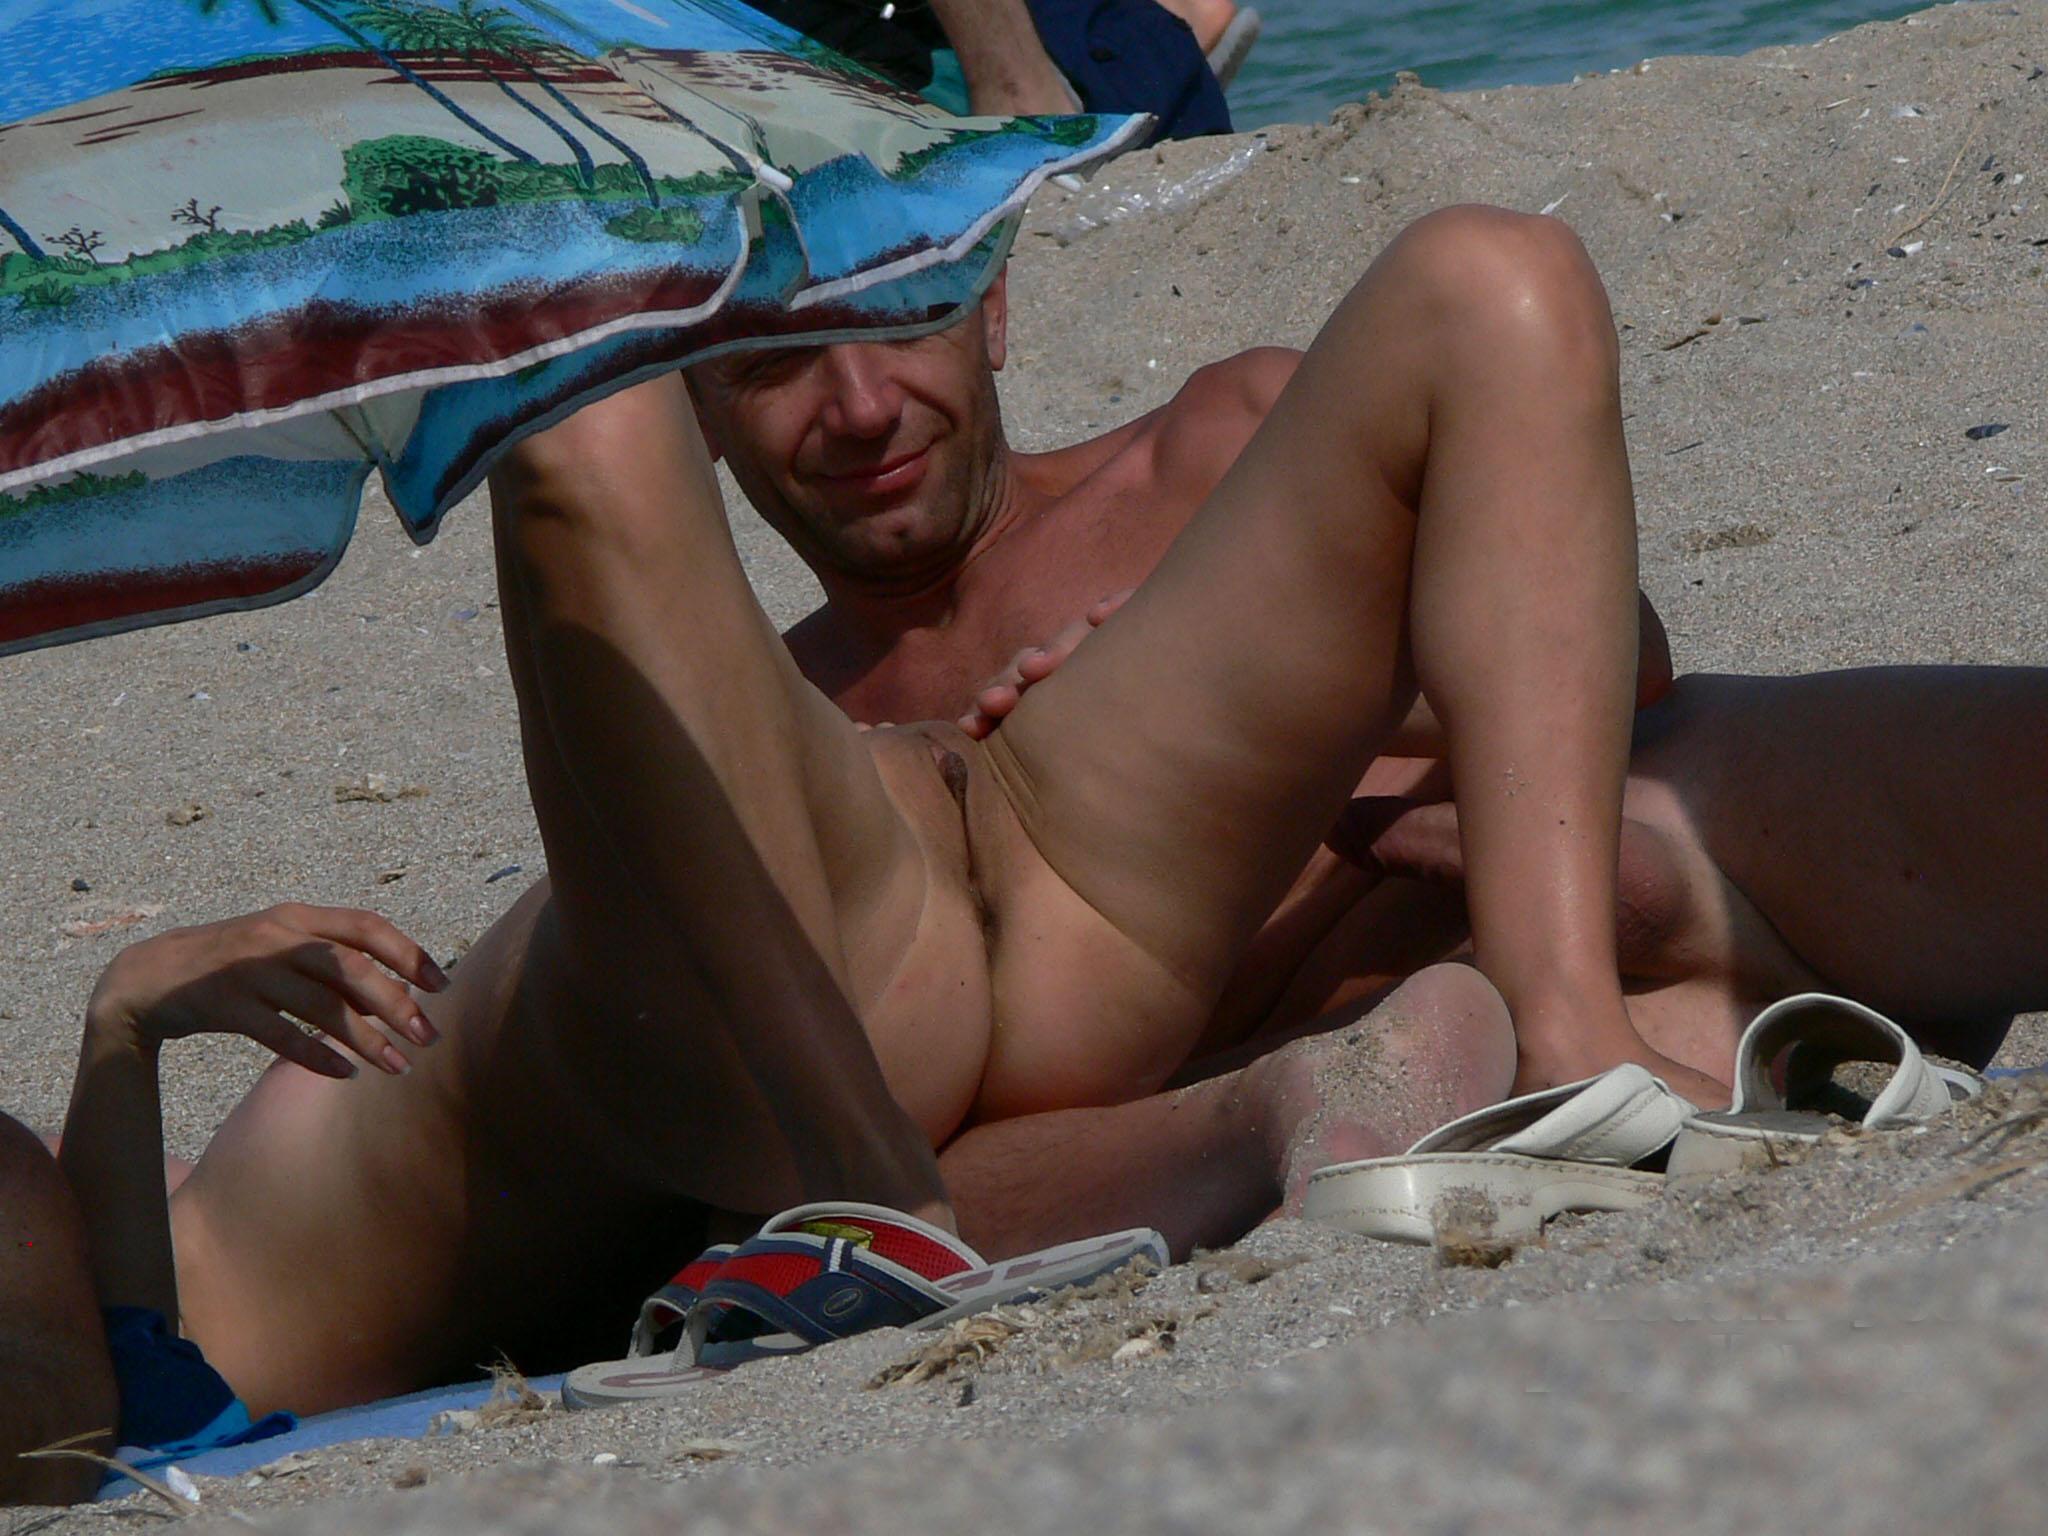 фото с пляжей интим